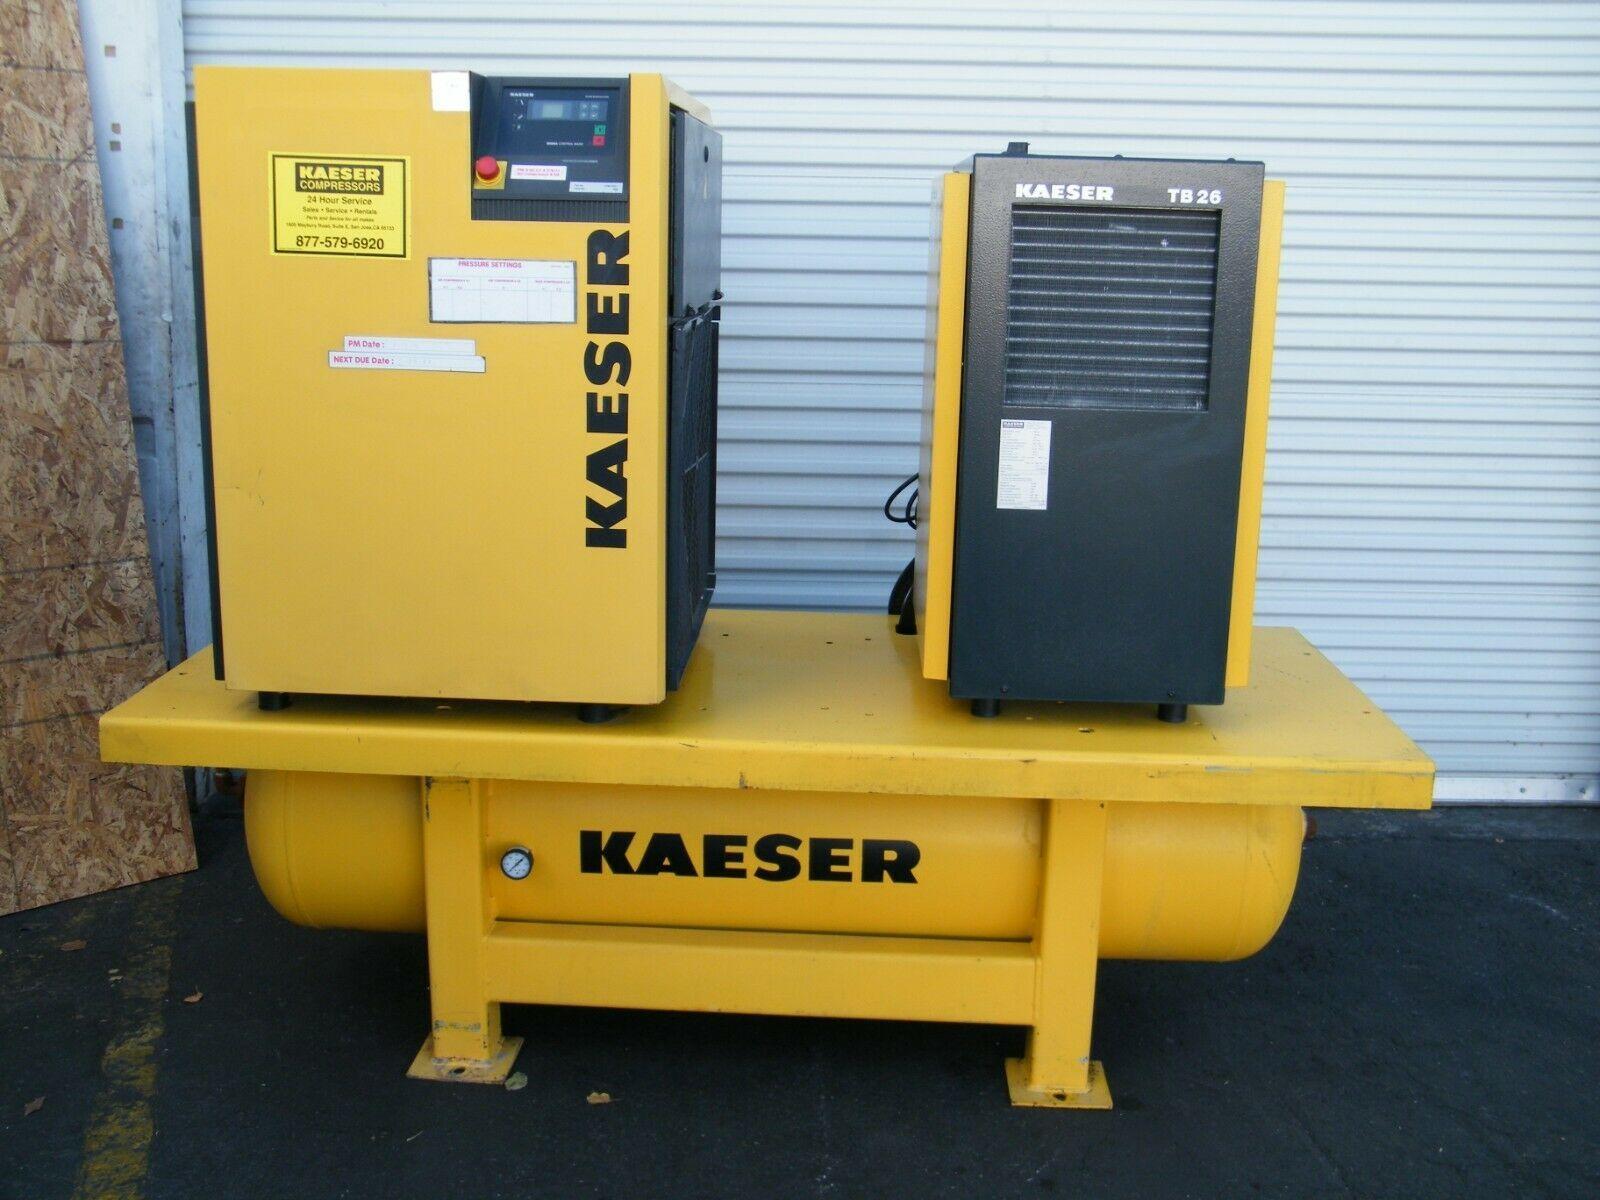 Kaeser Compressor in 2020 Air compressor tank, Air